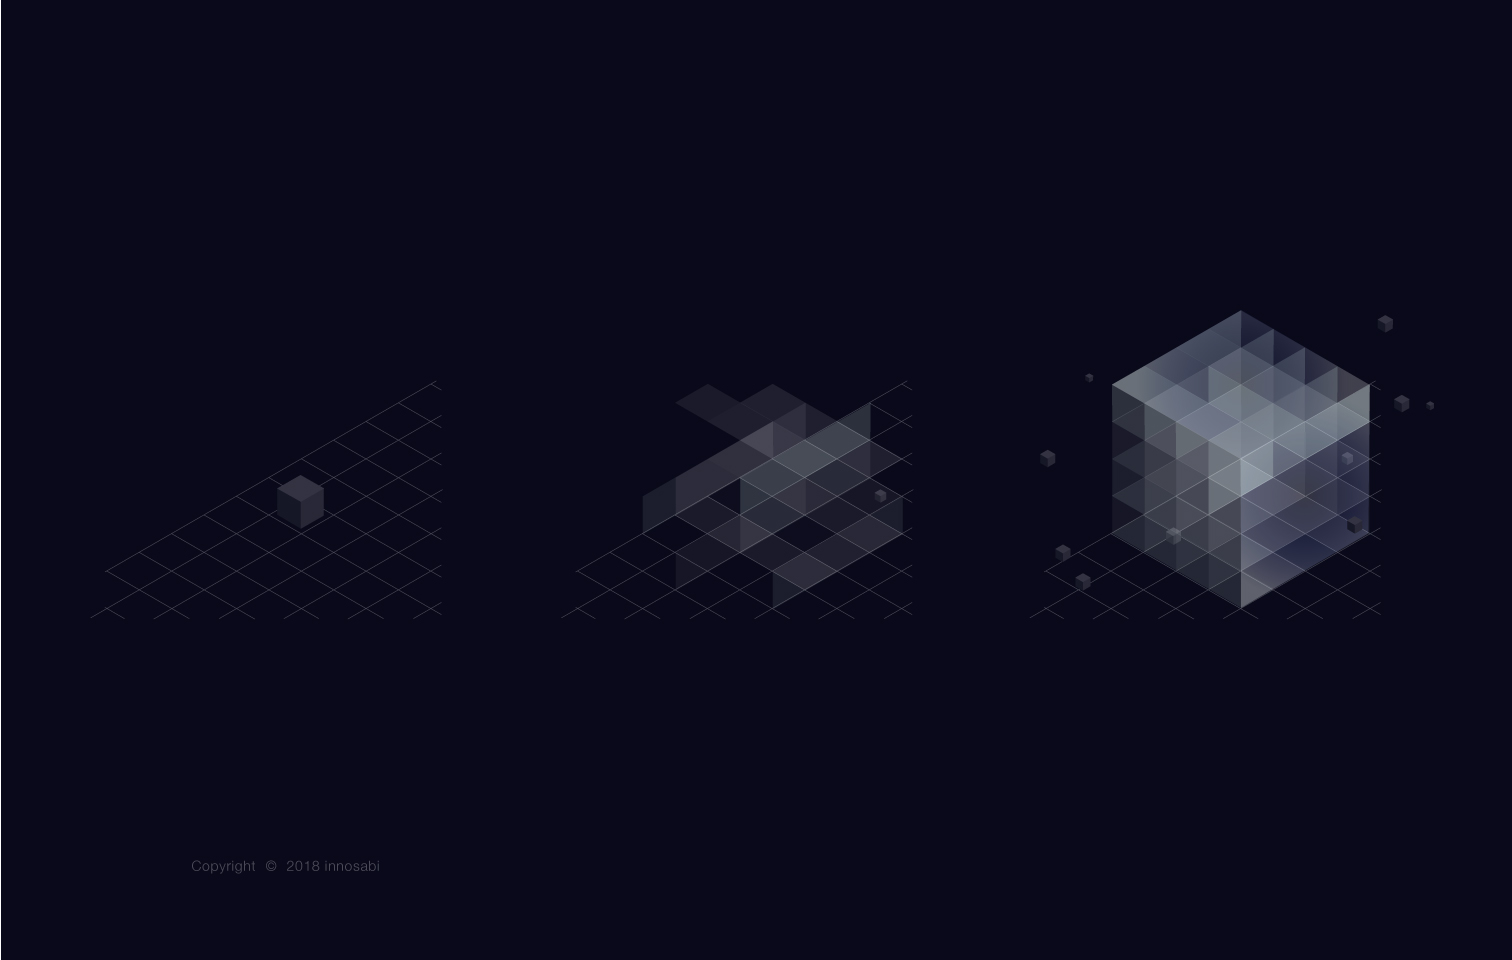 innosabi cube